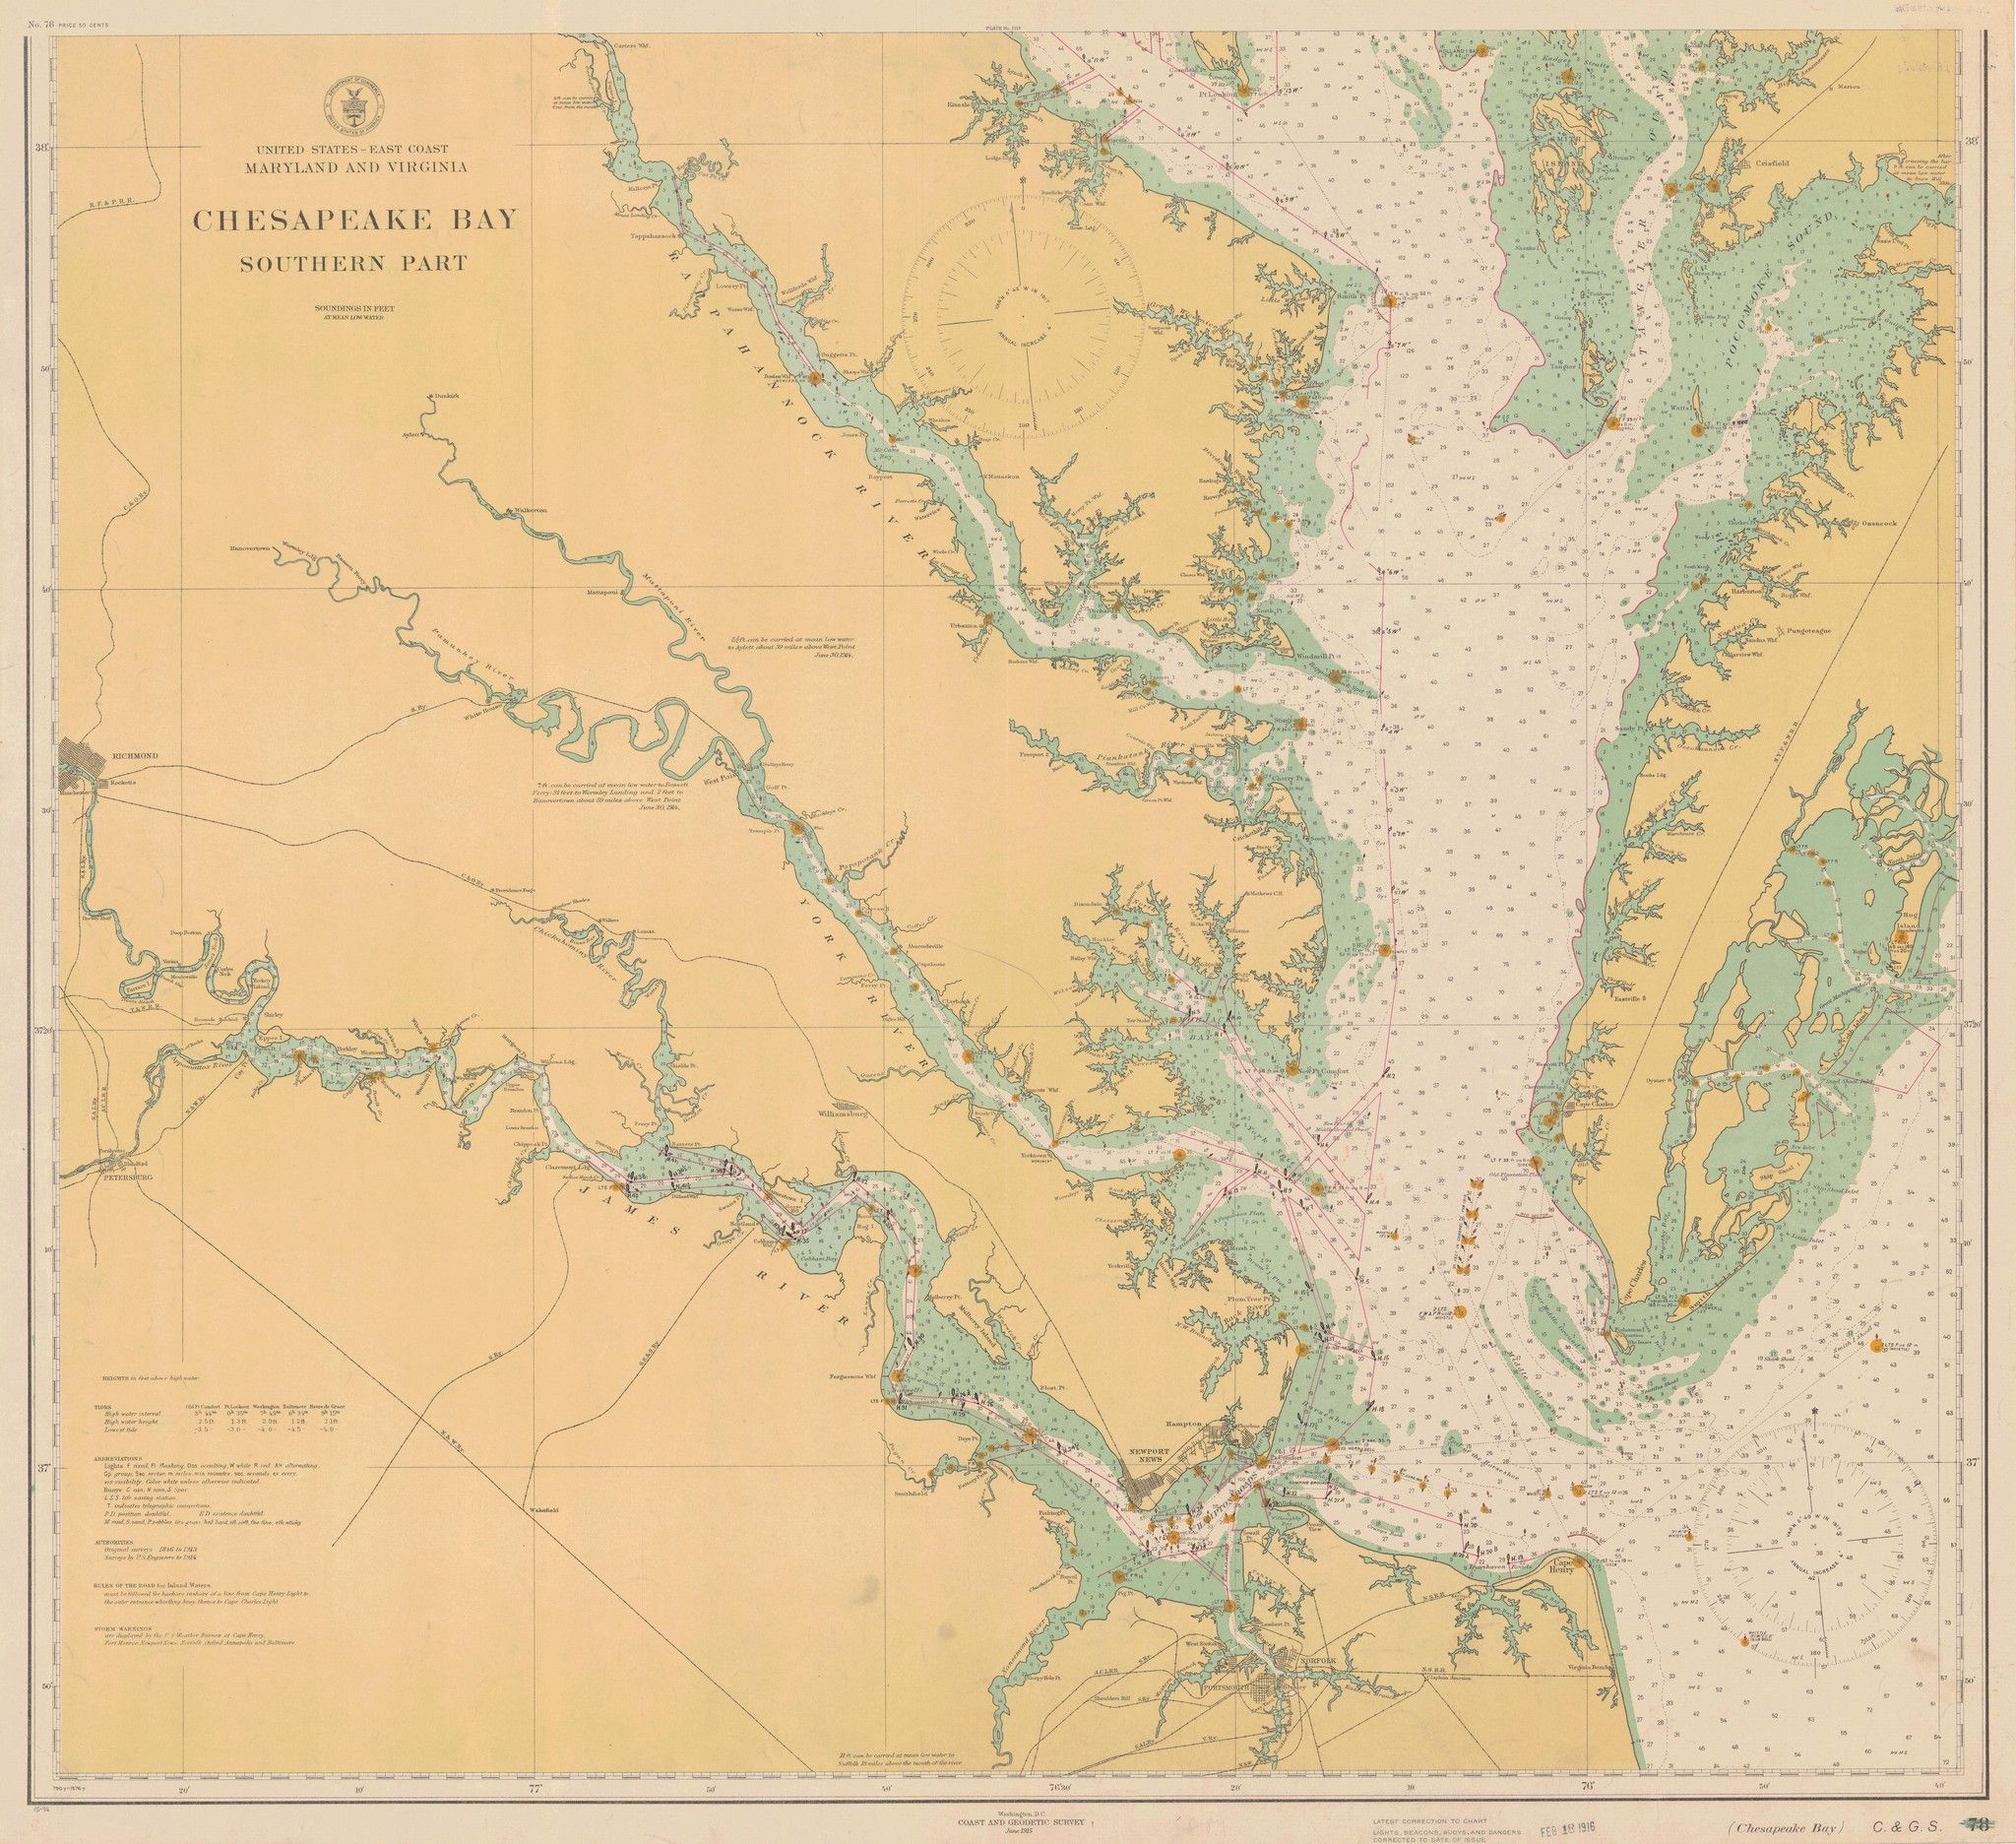 Chesapeake Bay Southern Part Historical Map Chesapeake - Us map chesapeake bay